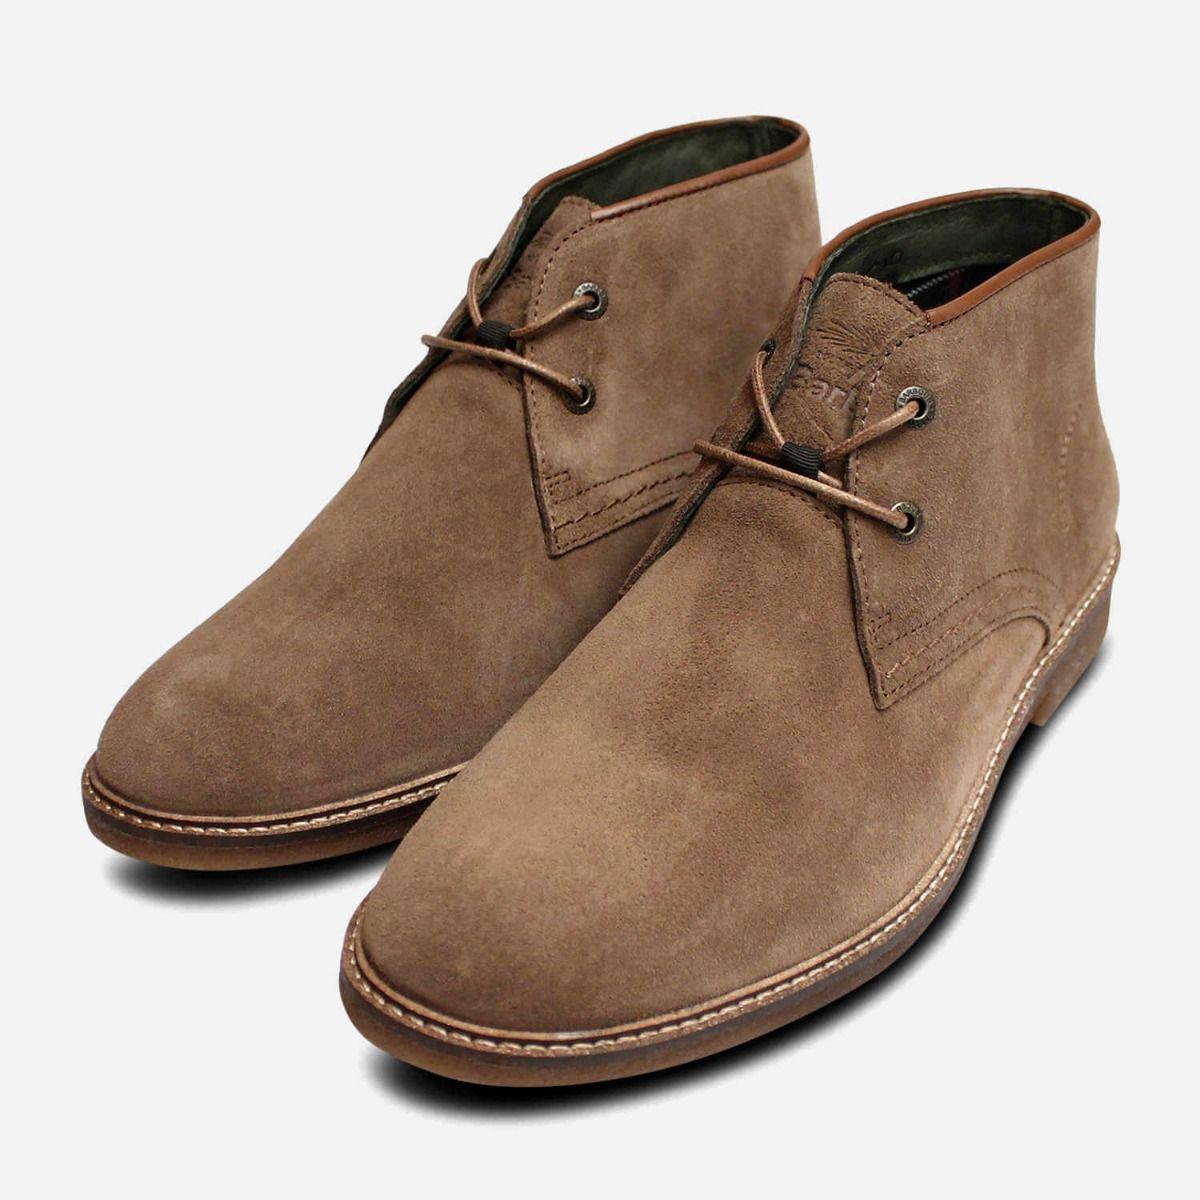 Barbour Kalahari 3 Mens Chukka Boots in